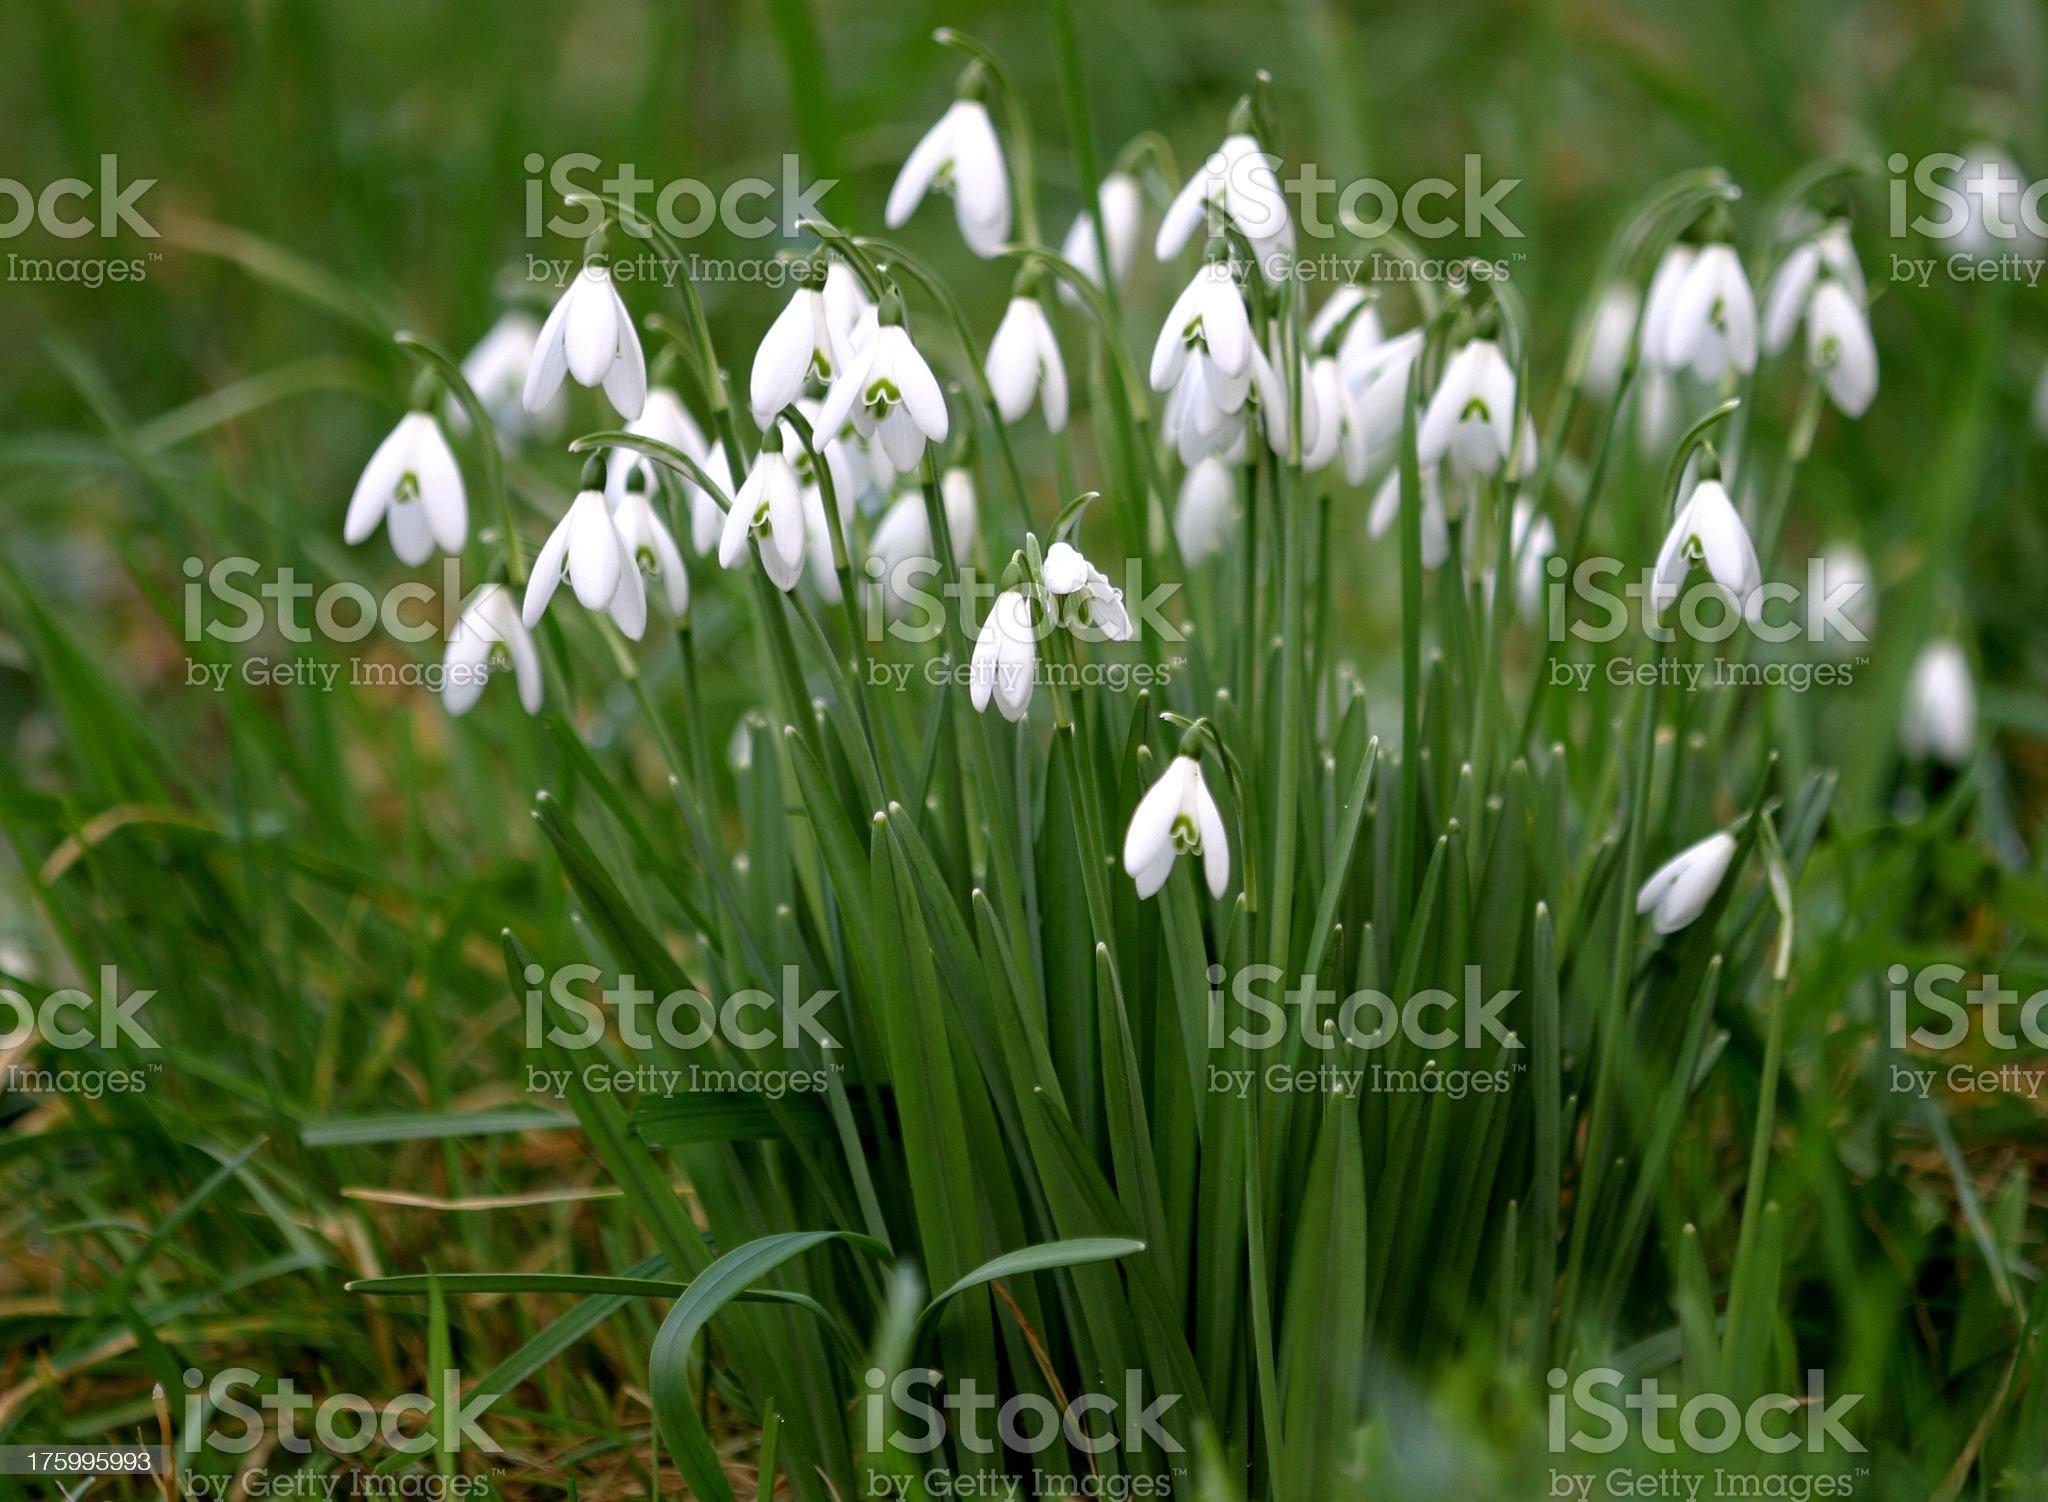 Galanthus nivalis royalty-free stock photo